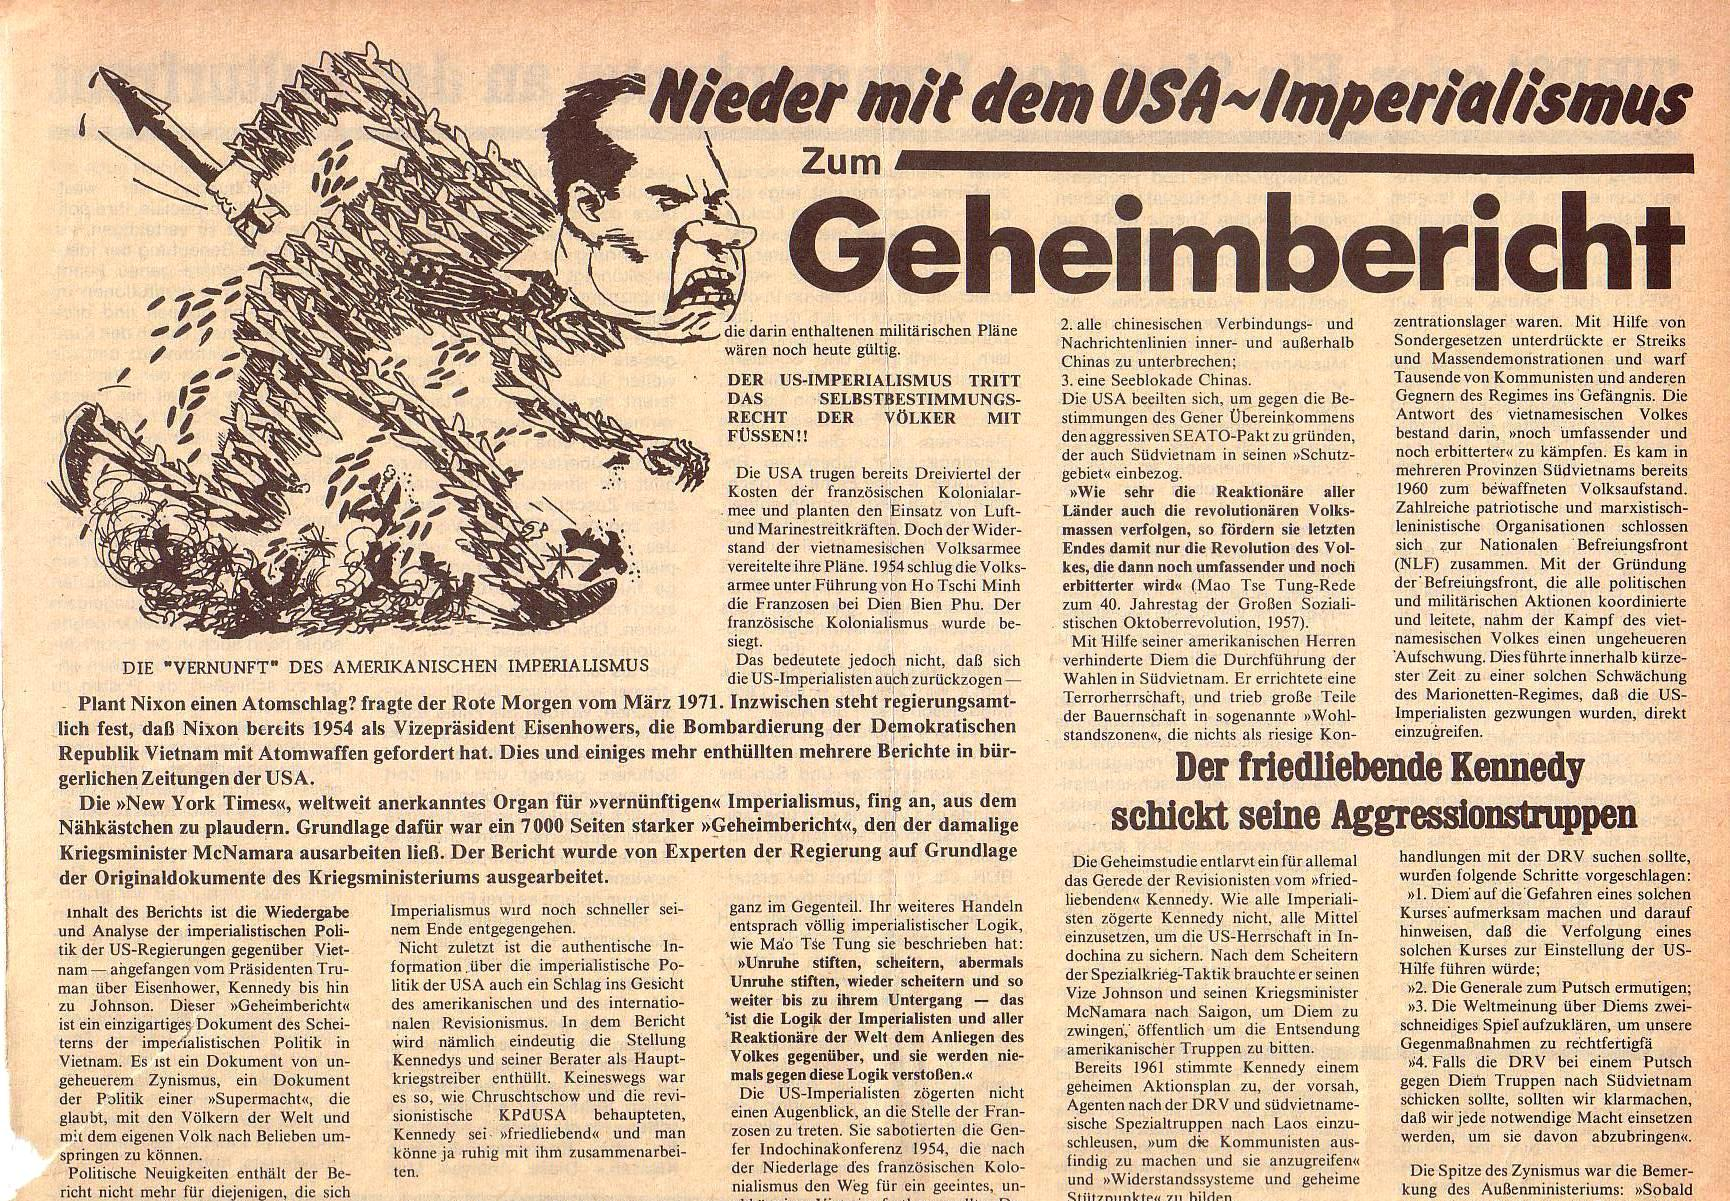 Roter Morgen, 5. Jg., Juli 1971, Nr. 7, Seite 7a